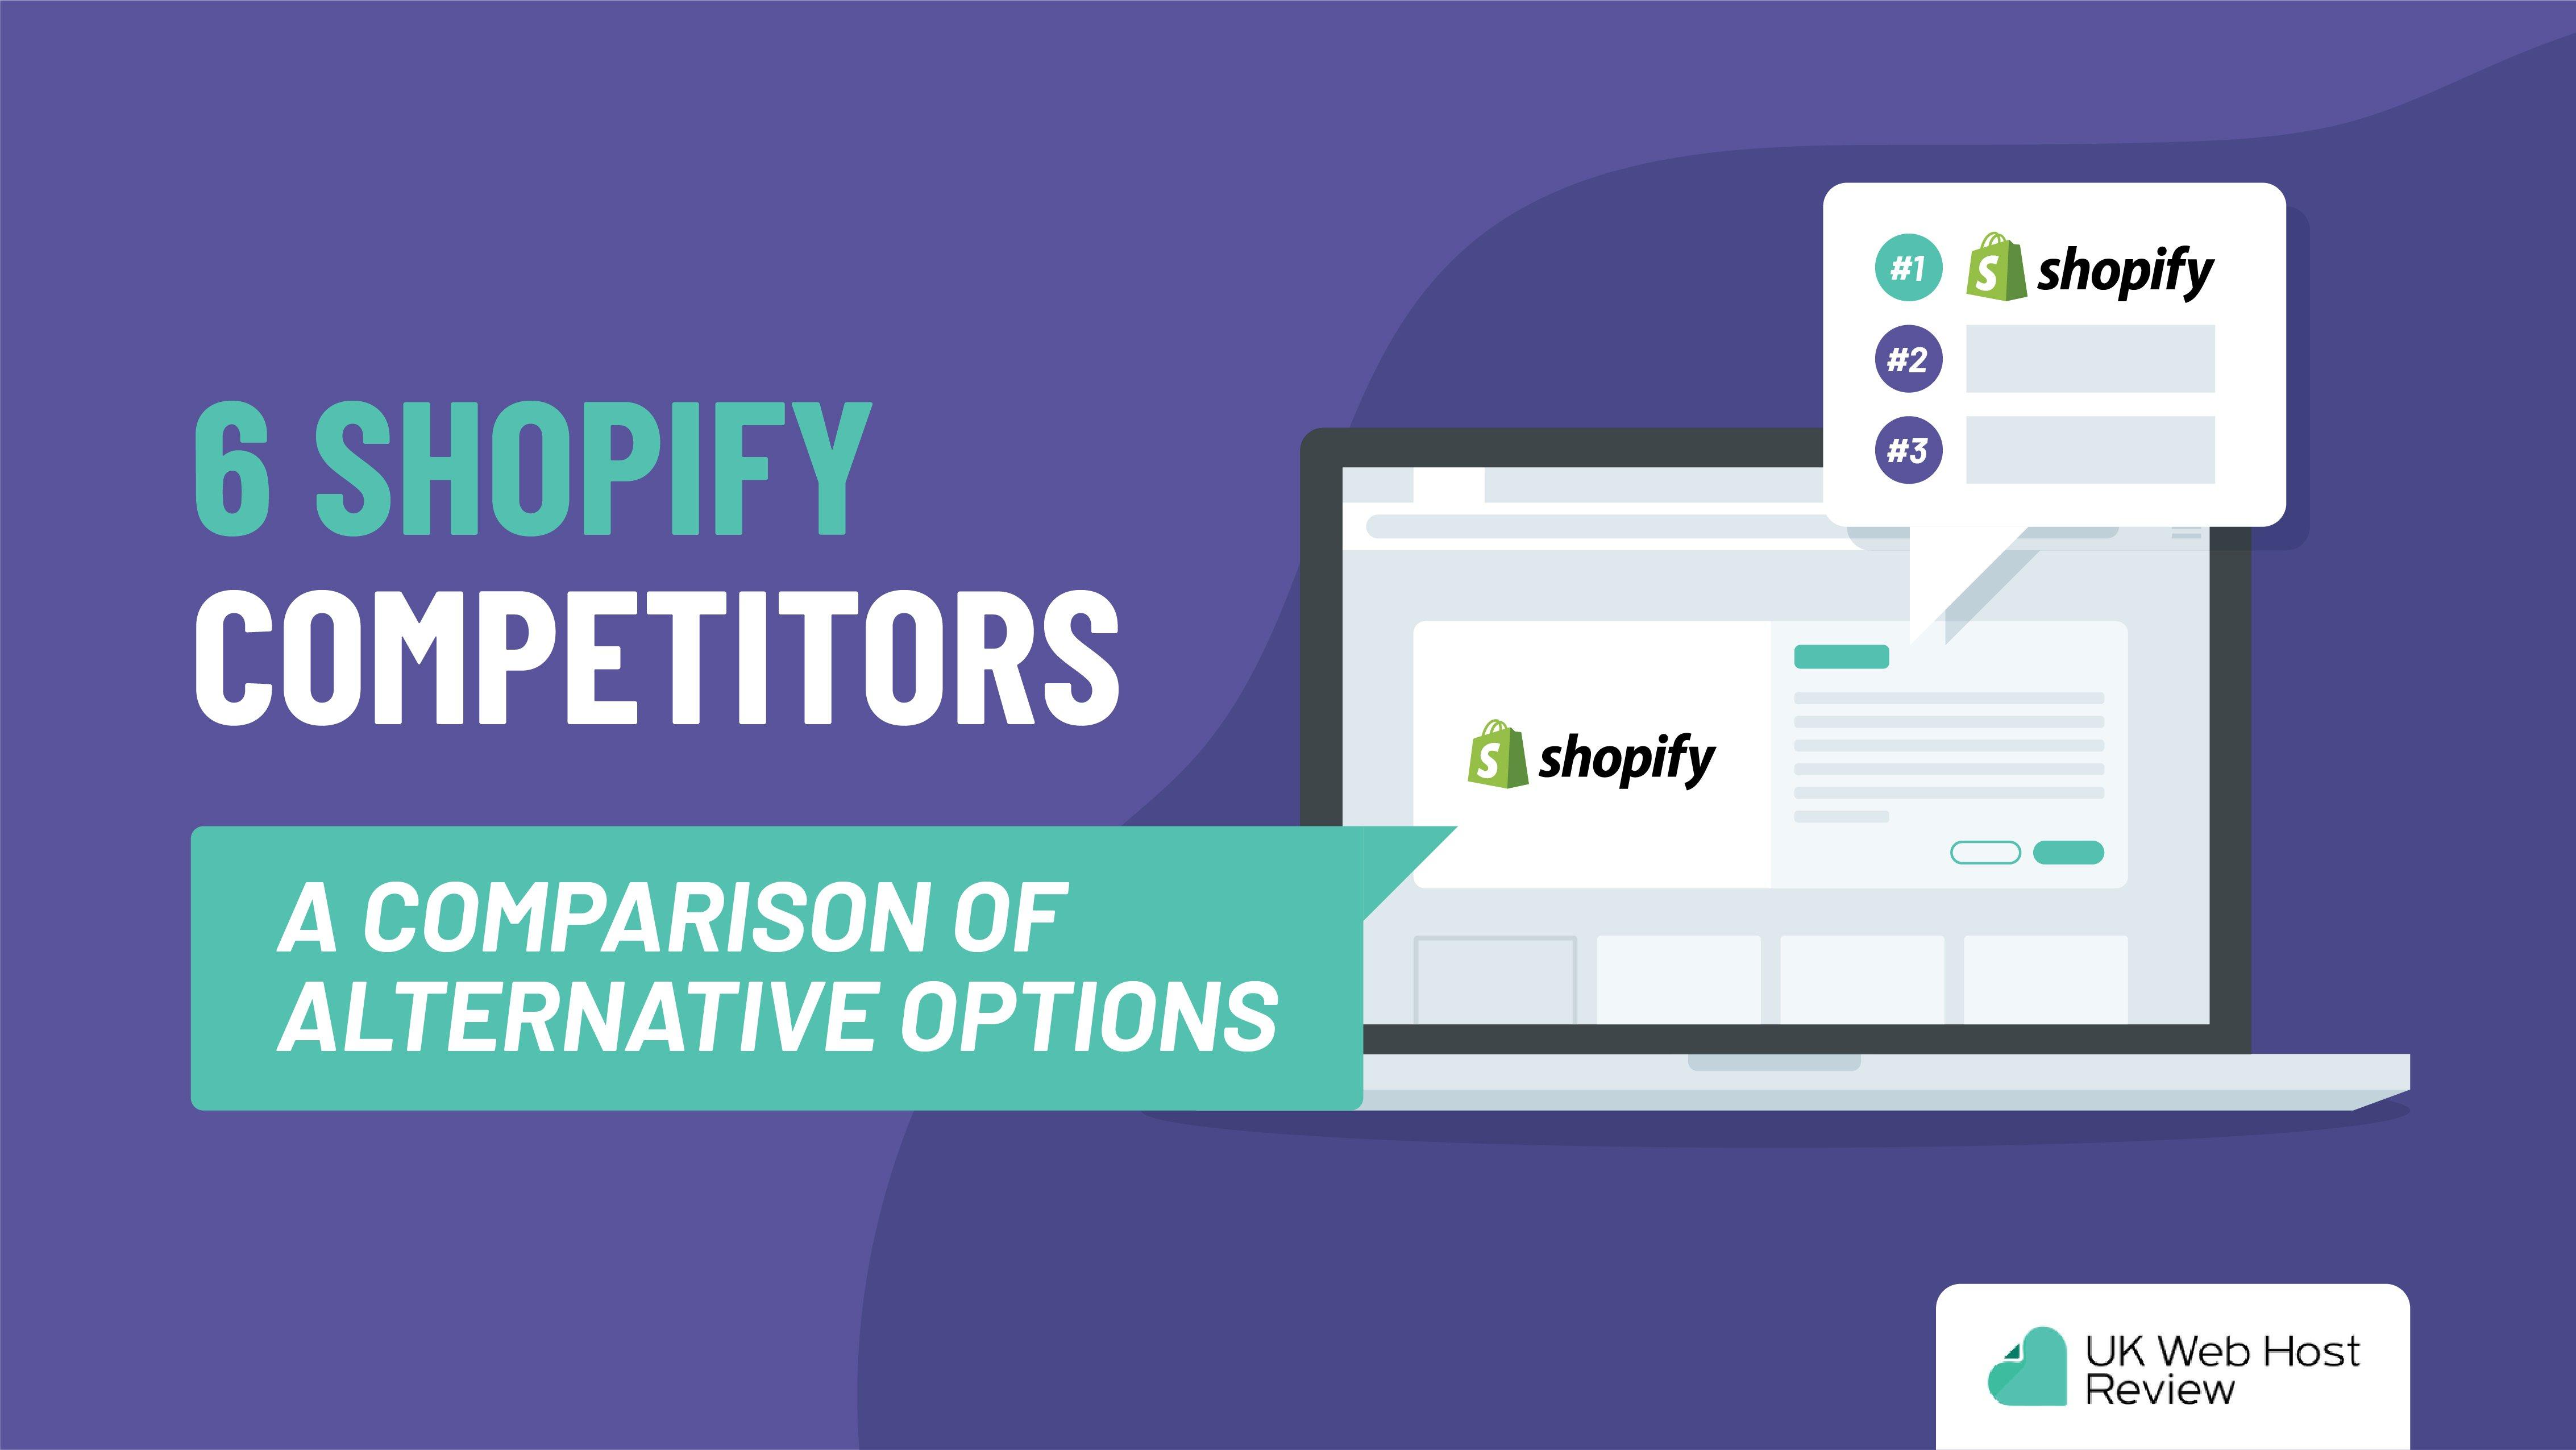 7 Shopify Competitors: A Comparison of Alternative Options